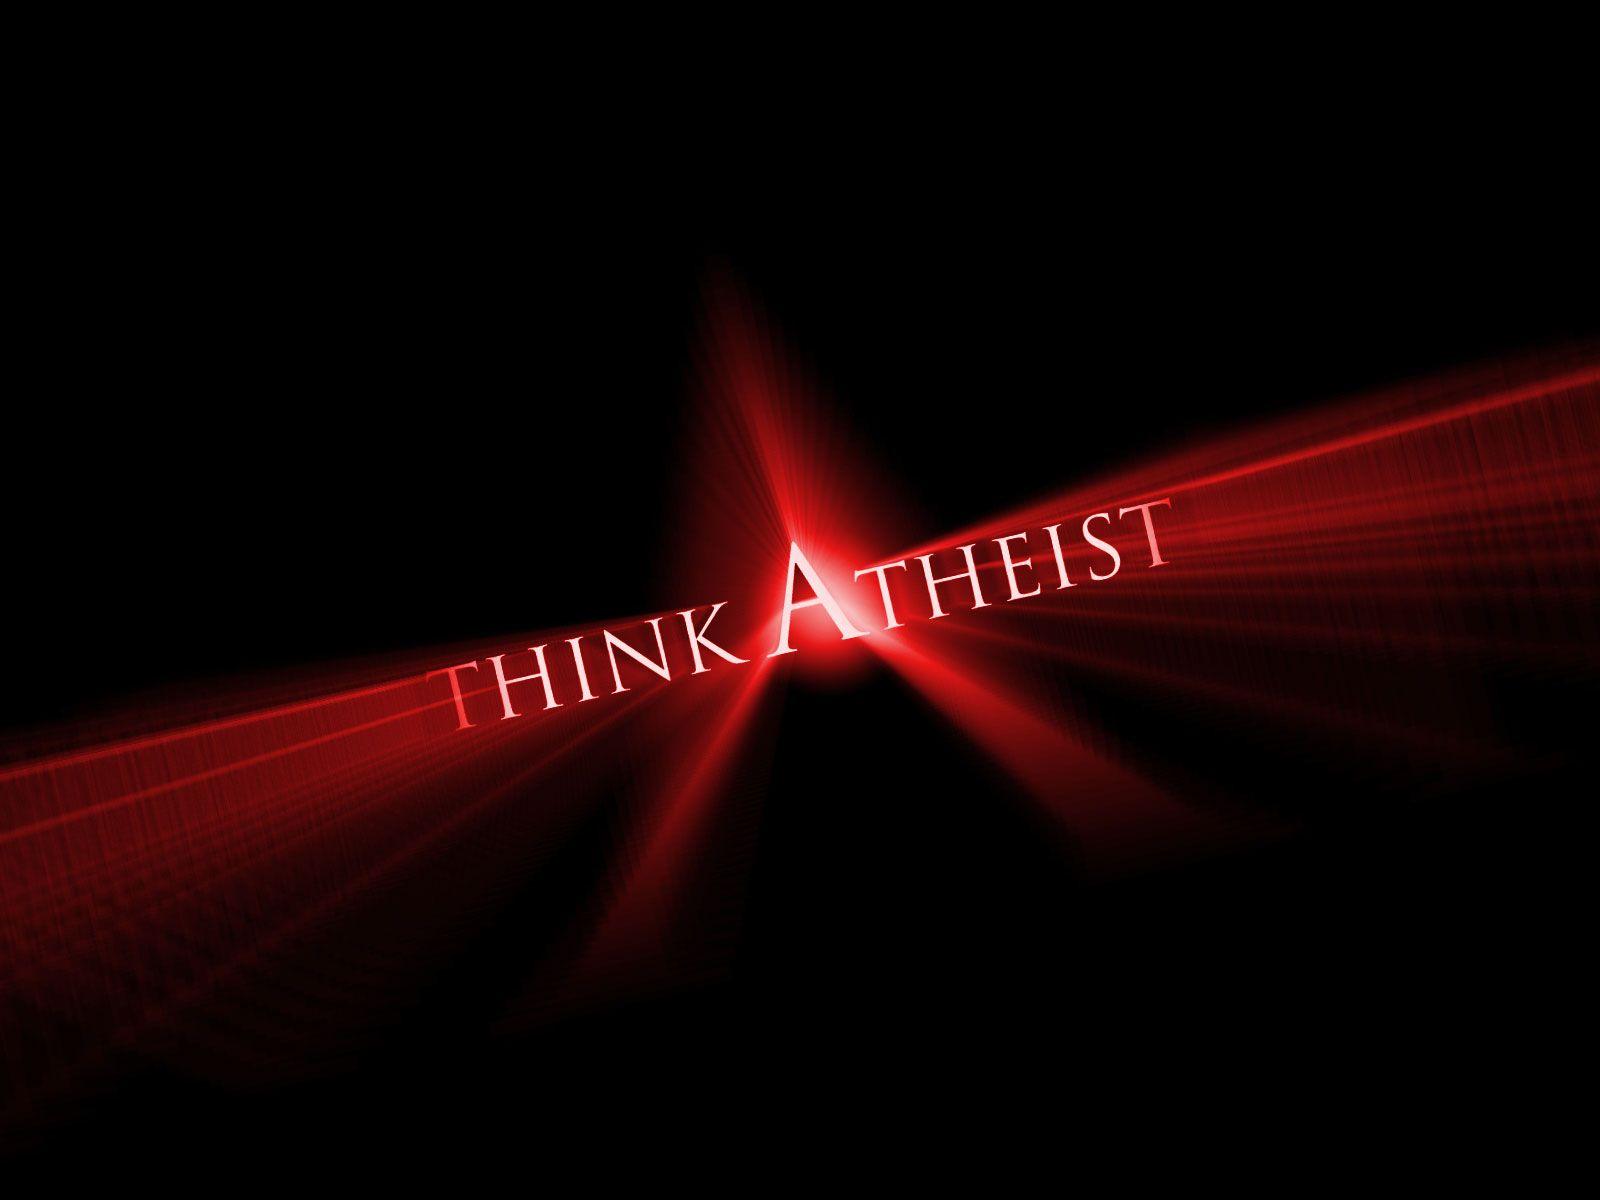 think atheist wallpaper | ta-wallpaper-think-atheist-atheist-wallpapers-wallpaper-hd-iphone ...